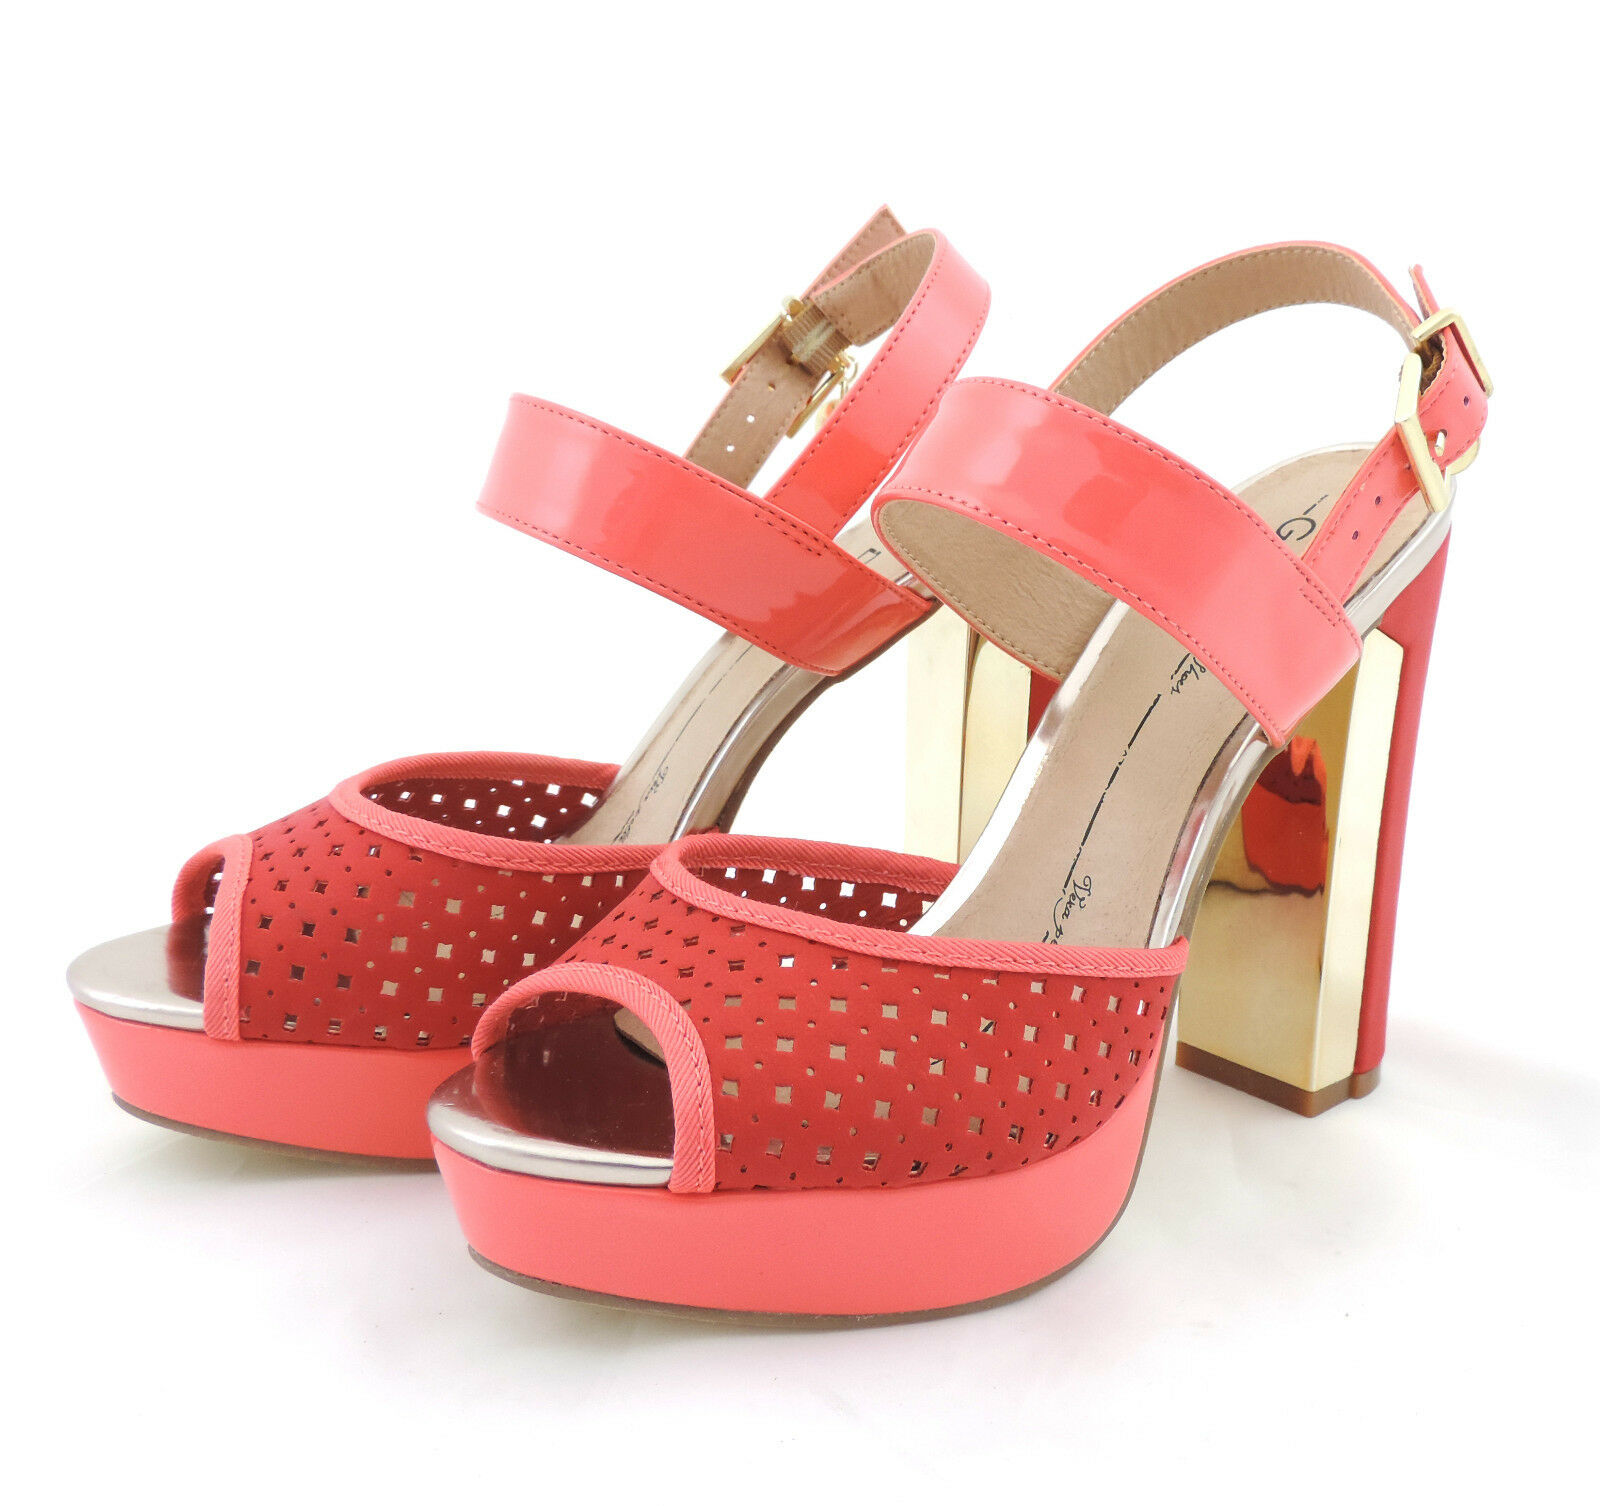 Gaudi  Sandalee high heels rosa lachs  Schuhe pumps neu